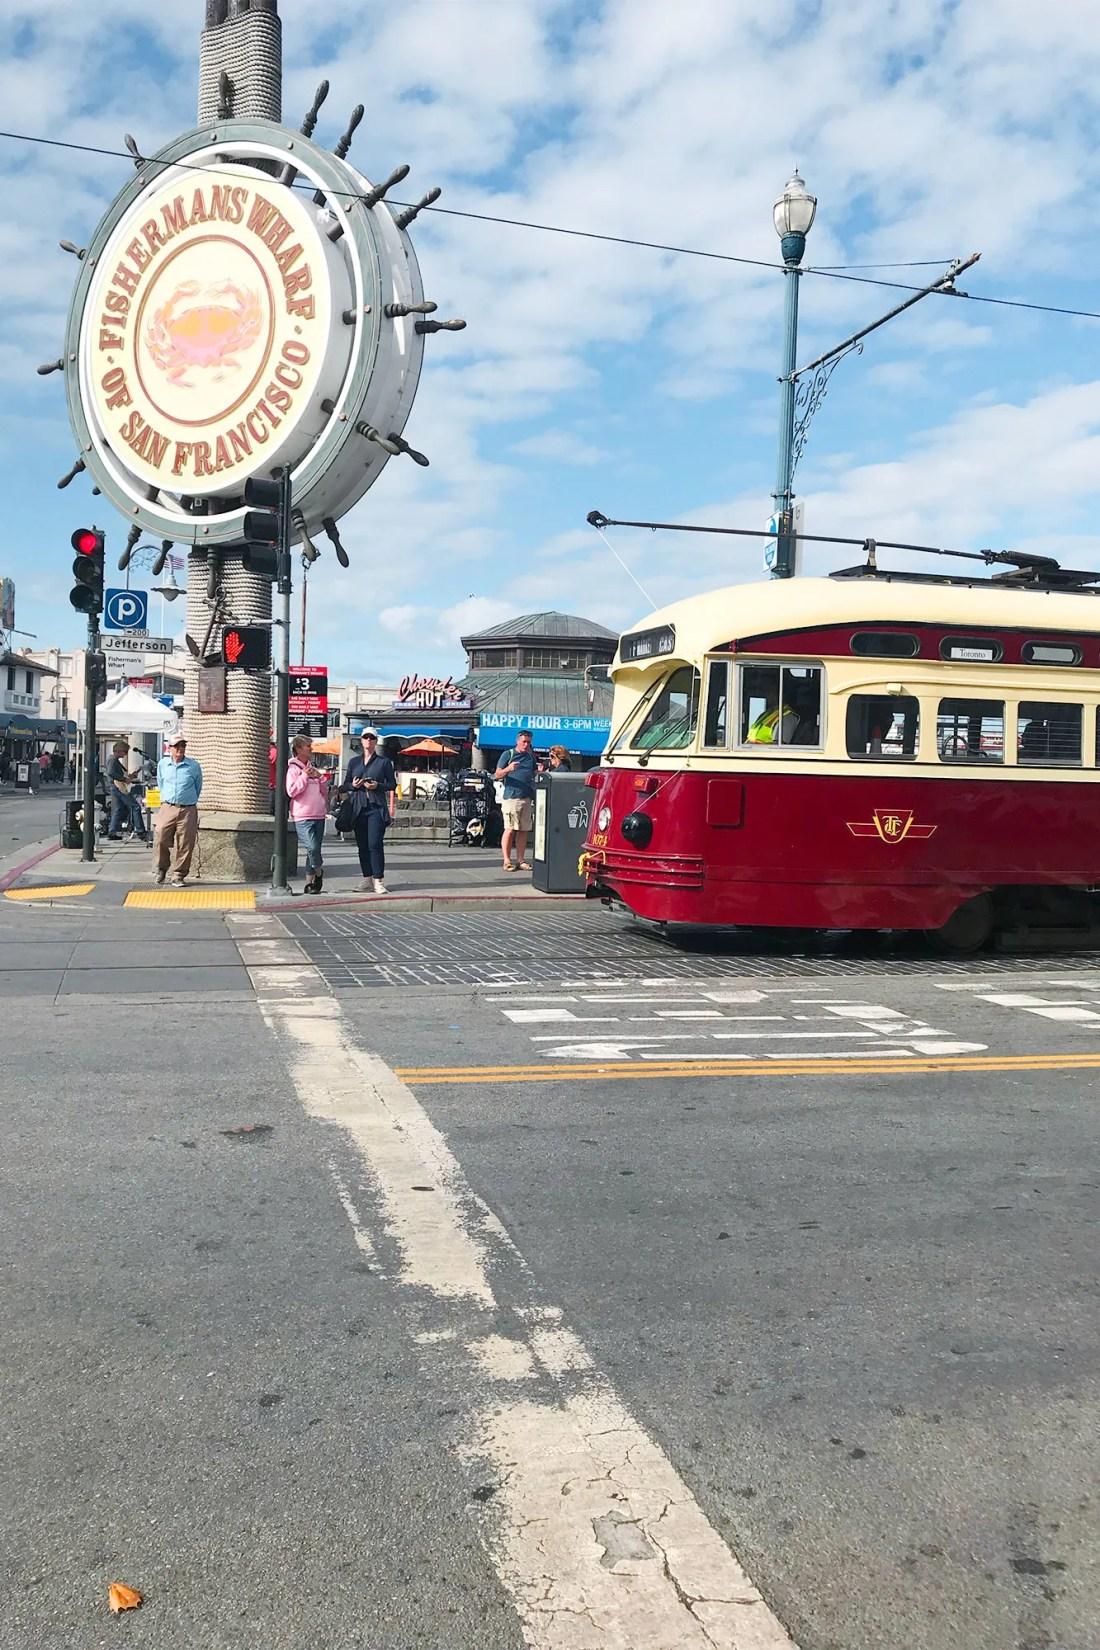 Fisherman's Wharf in San Francisco, California   Local Love and Wanderlust